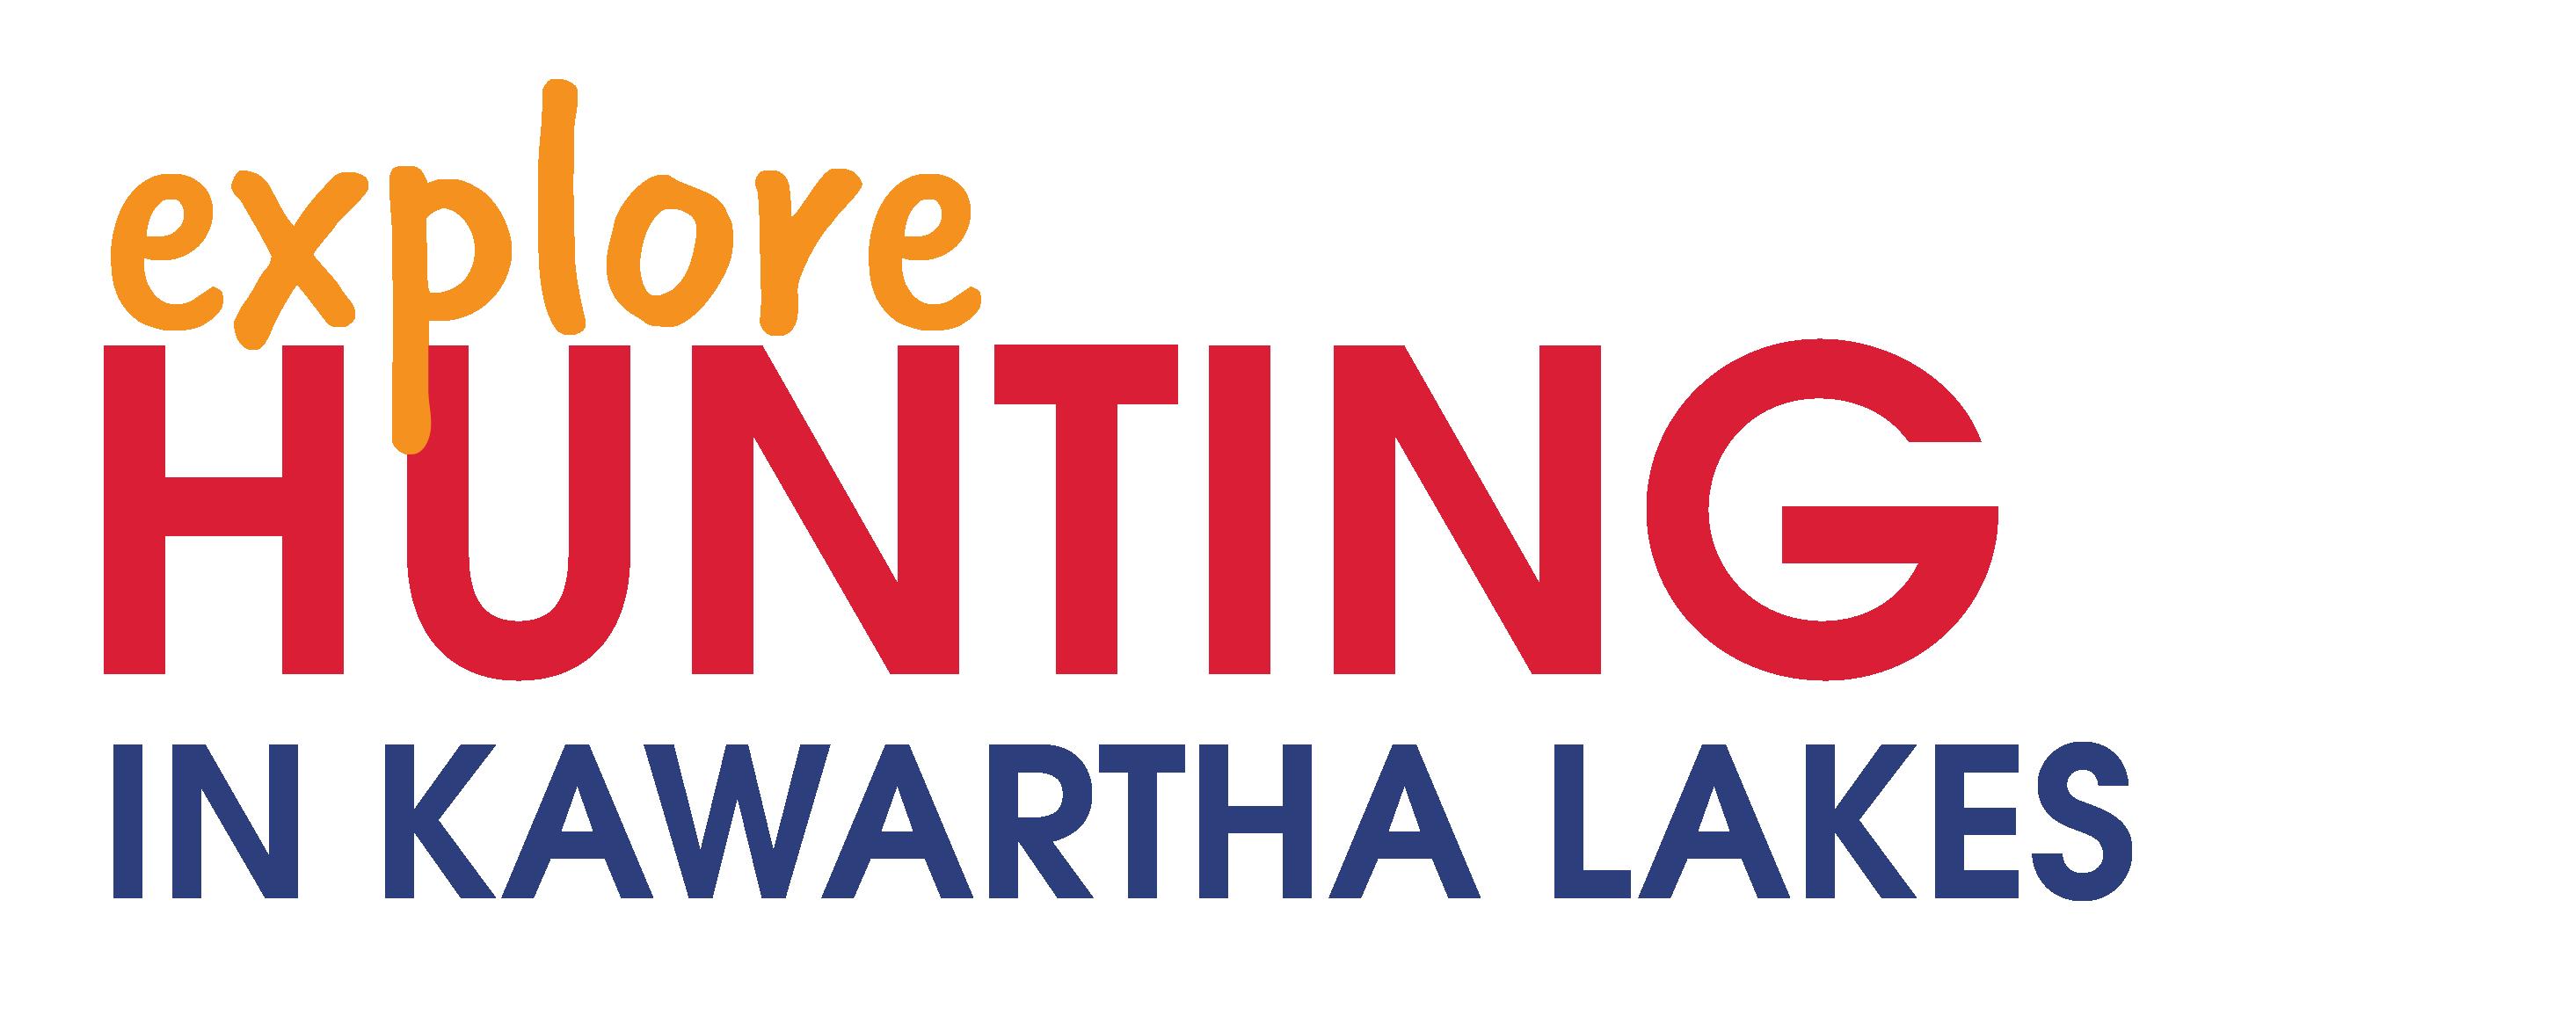 Explore Hunting in Kawartha Lakes